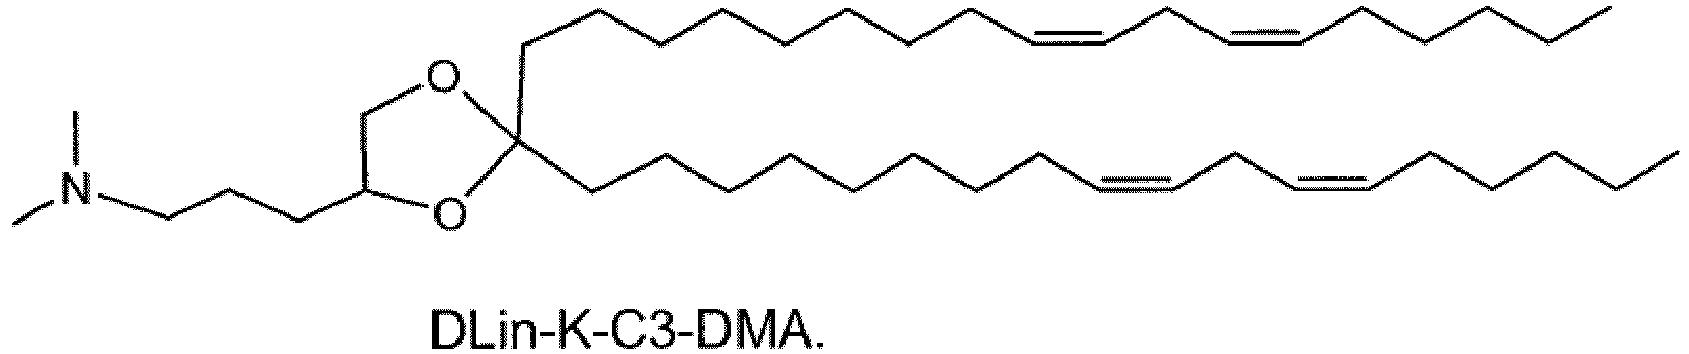 Figure imgb0115